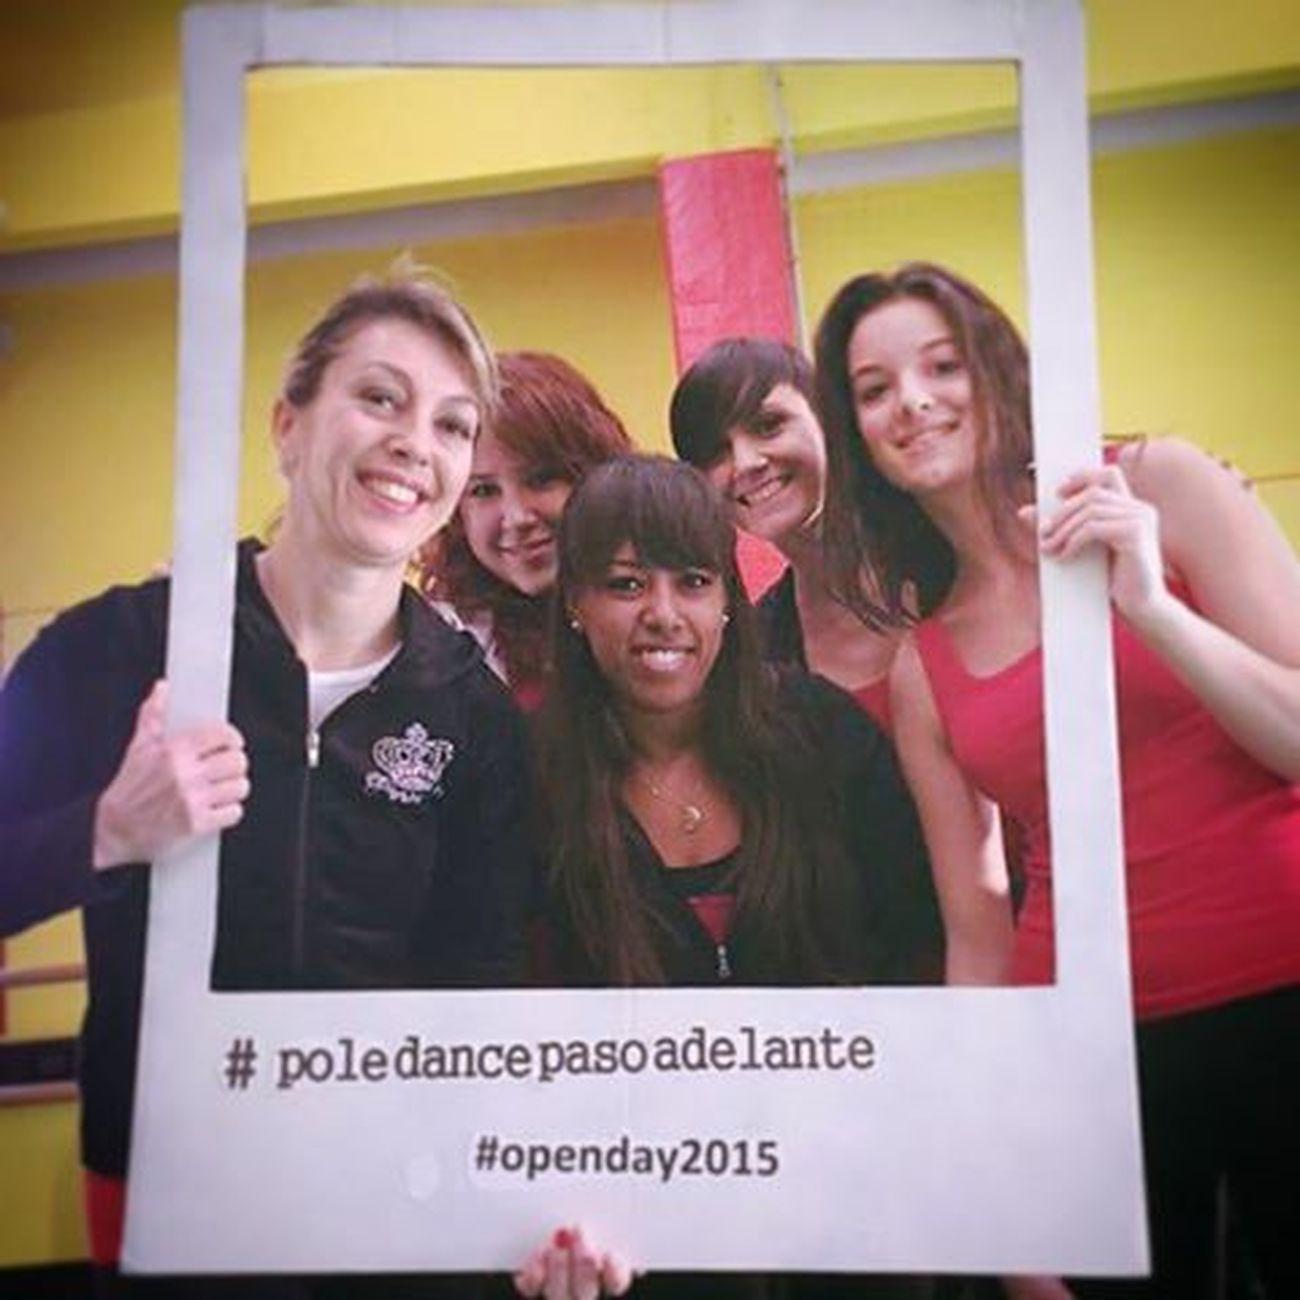 Some of Pole crew Beginner 😁❤...Christmas Open day show 🎉🎊 Poledance Poledancebeginners Christmasopenday Pasoadelante Polecrewbeginners